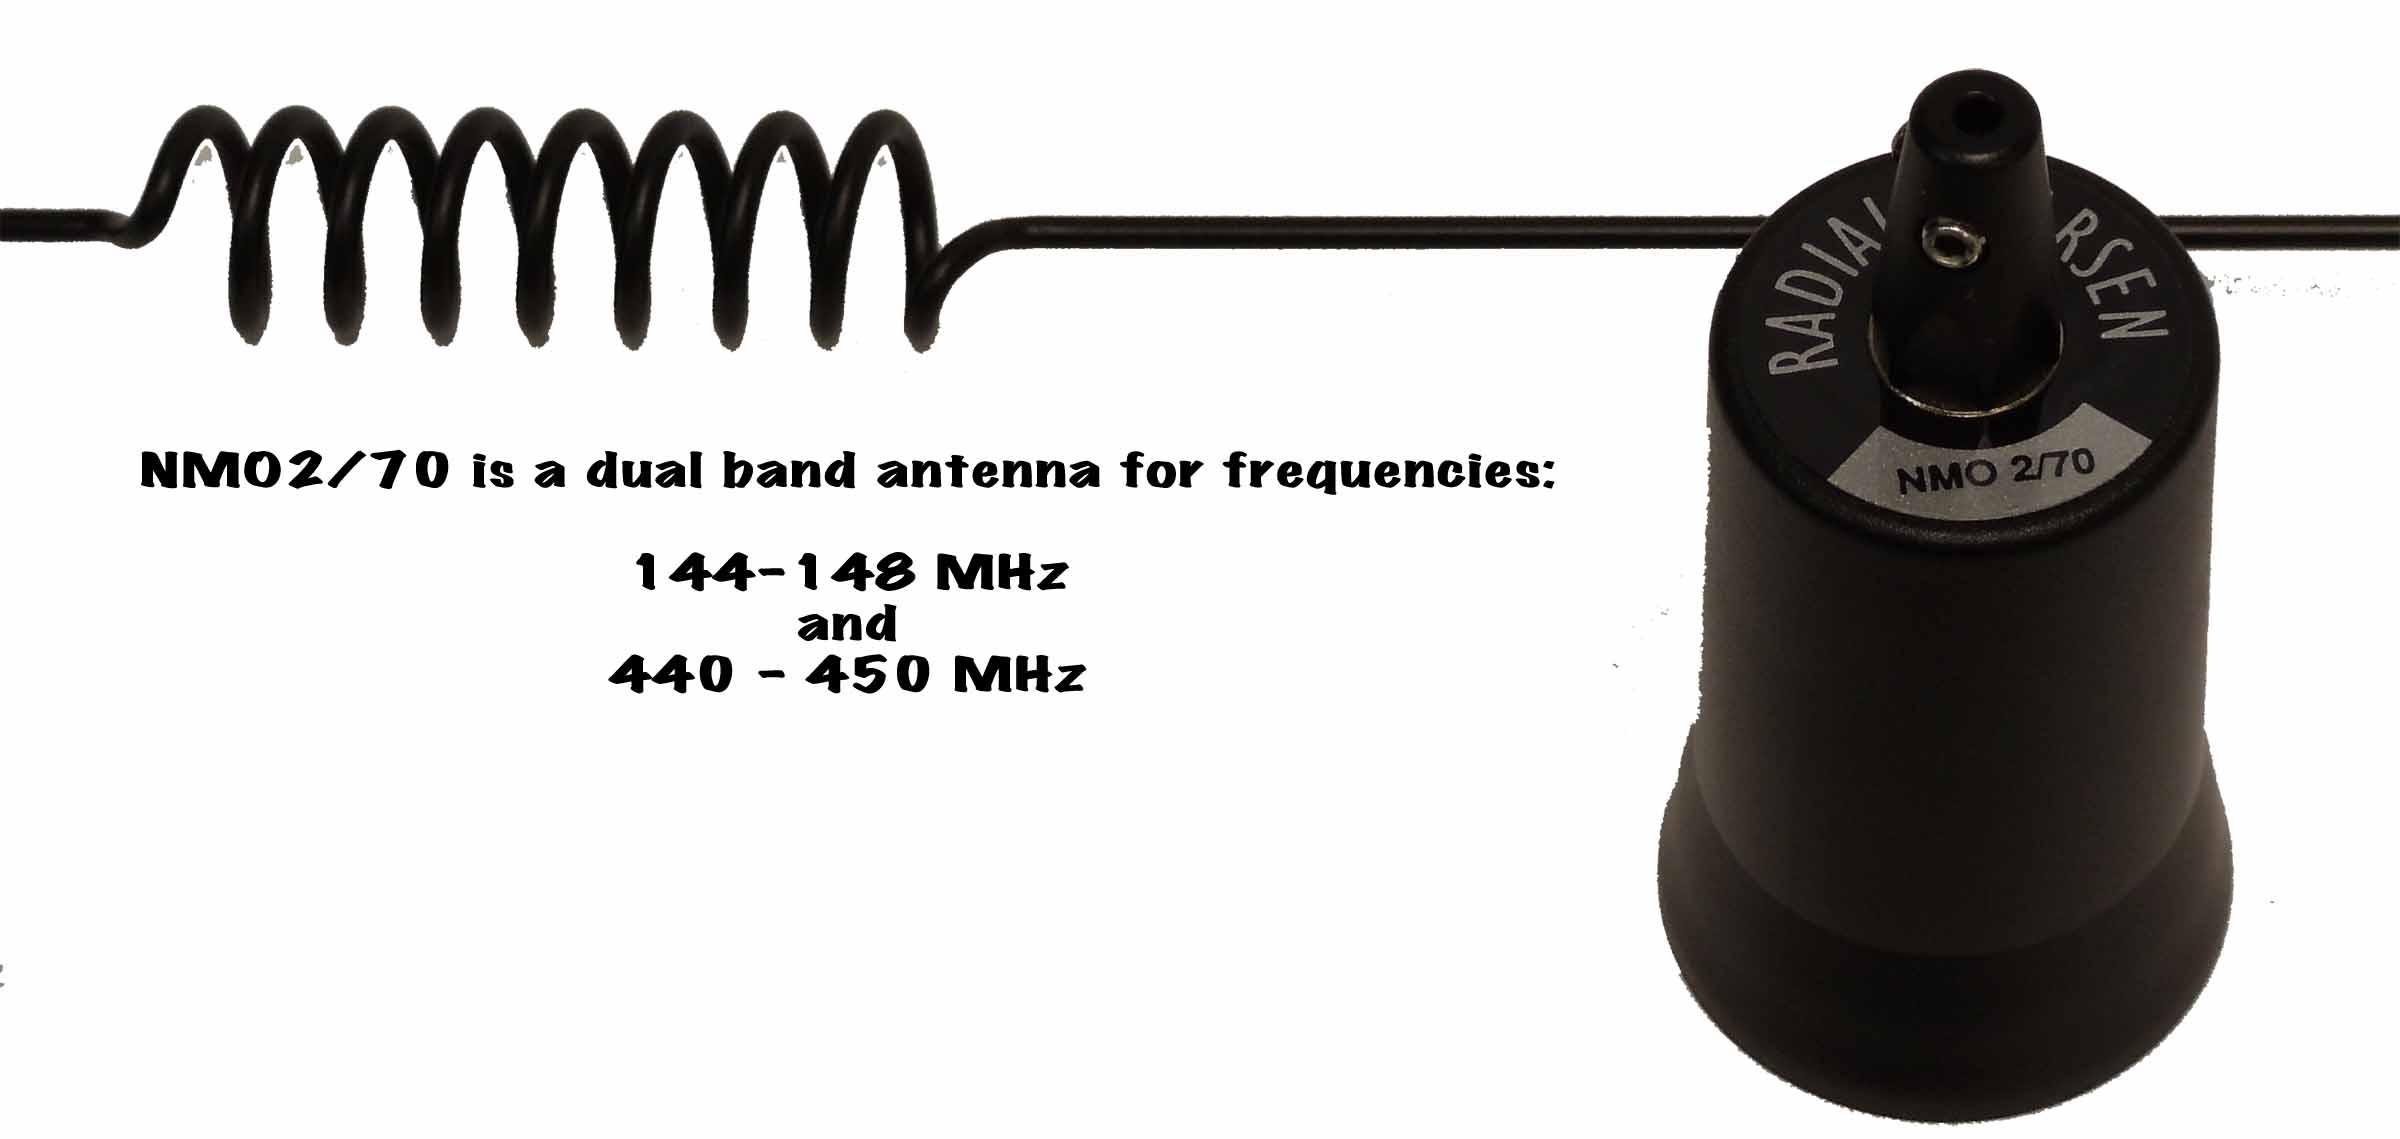 NMO270B - Larsen Black Coil & Whip Antenna 144-148Mhz 440-450Mhz